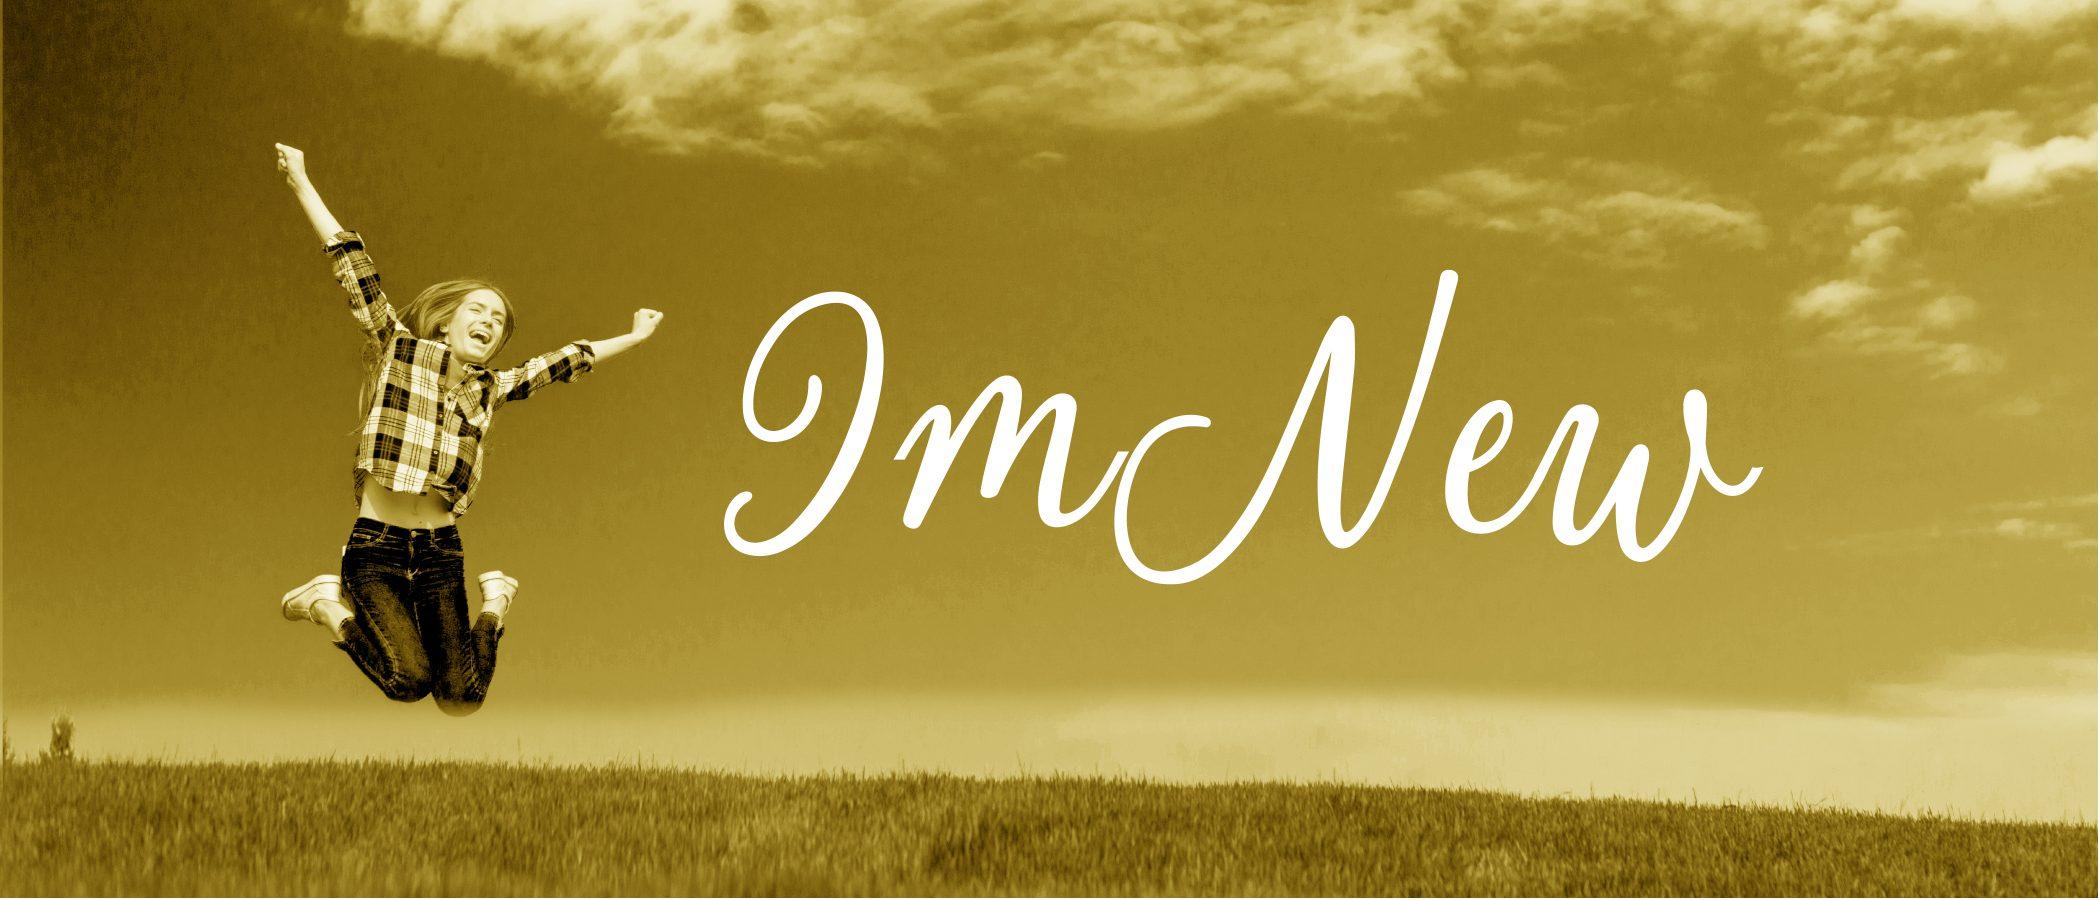 im-new-11brd-dq2021-web-banner2x-100